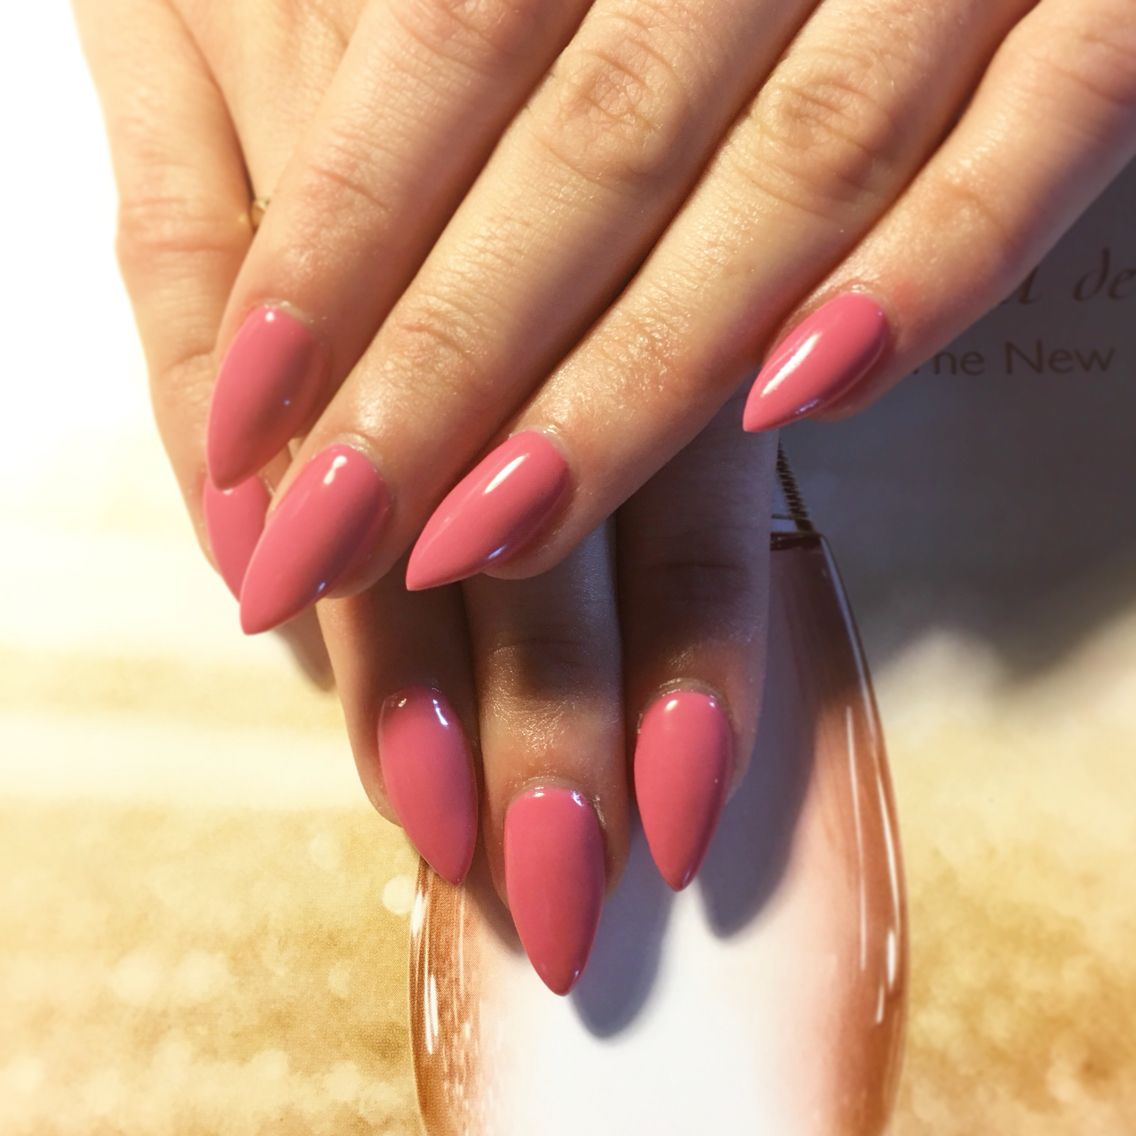 Semilac Gel Polish In Pinkrose Nr 064 On Lalafuu Ig Bossydemon Done By Me Realaguss Nails Gel Polish My Nails